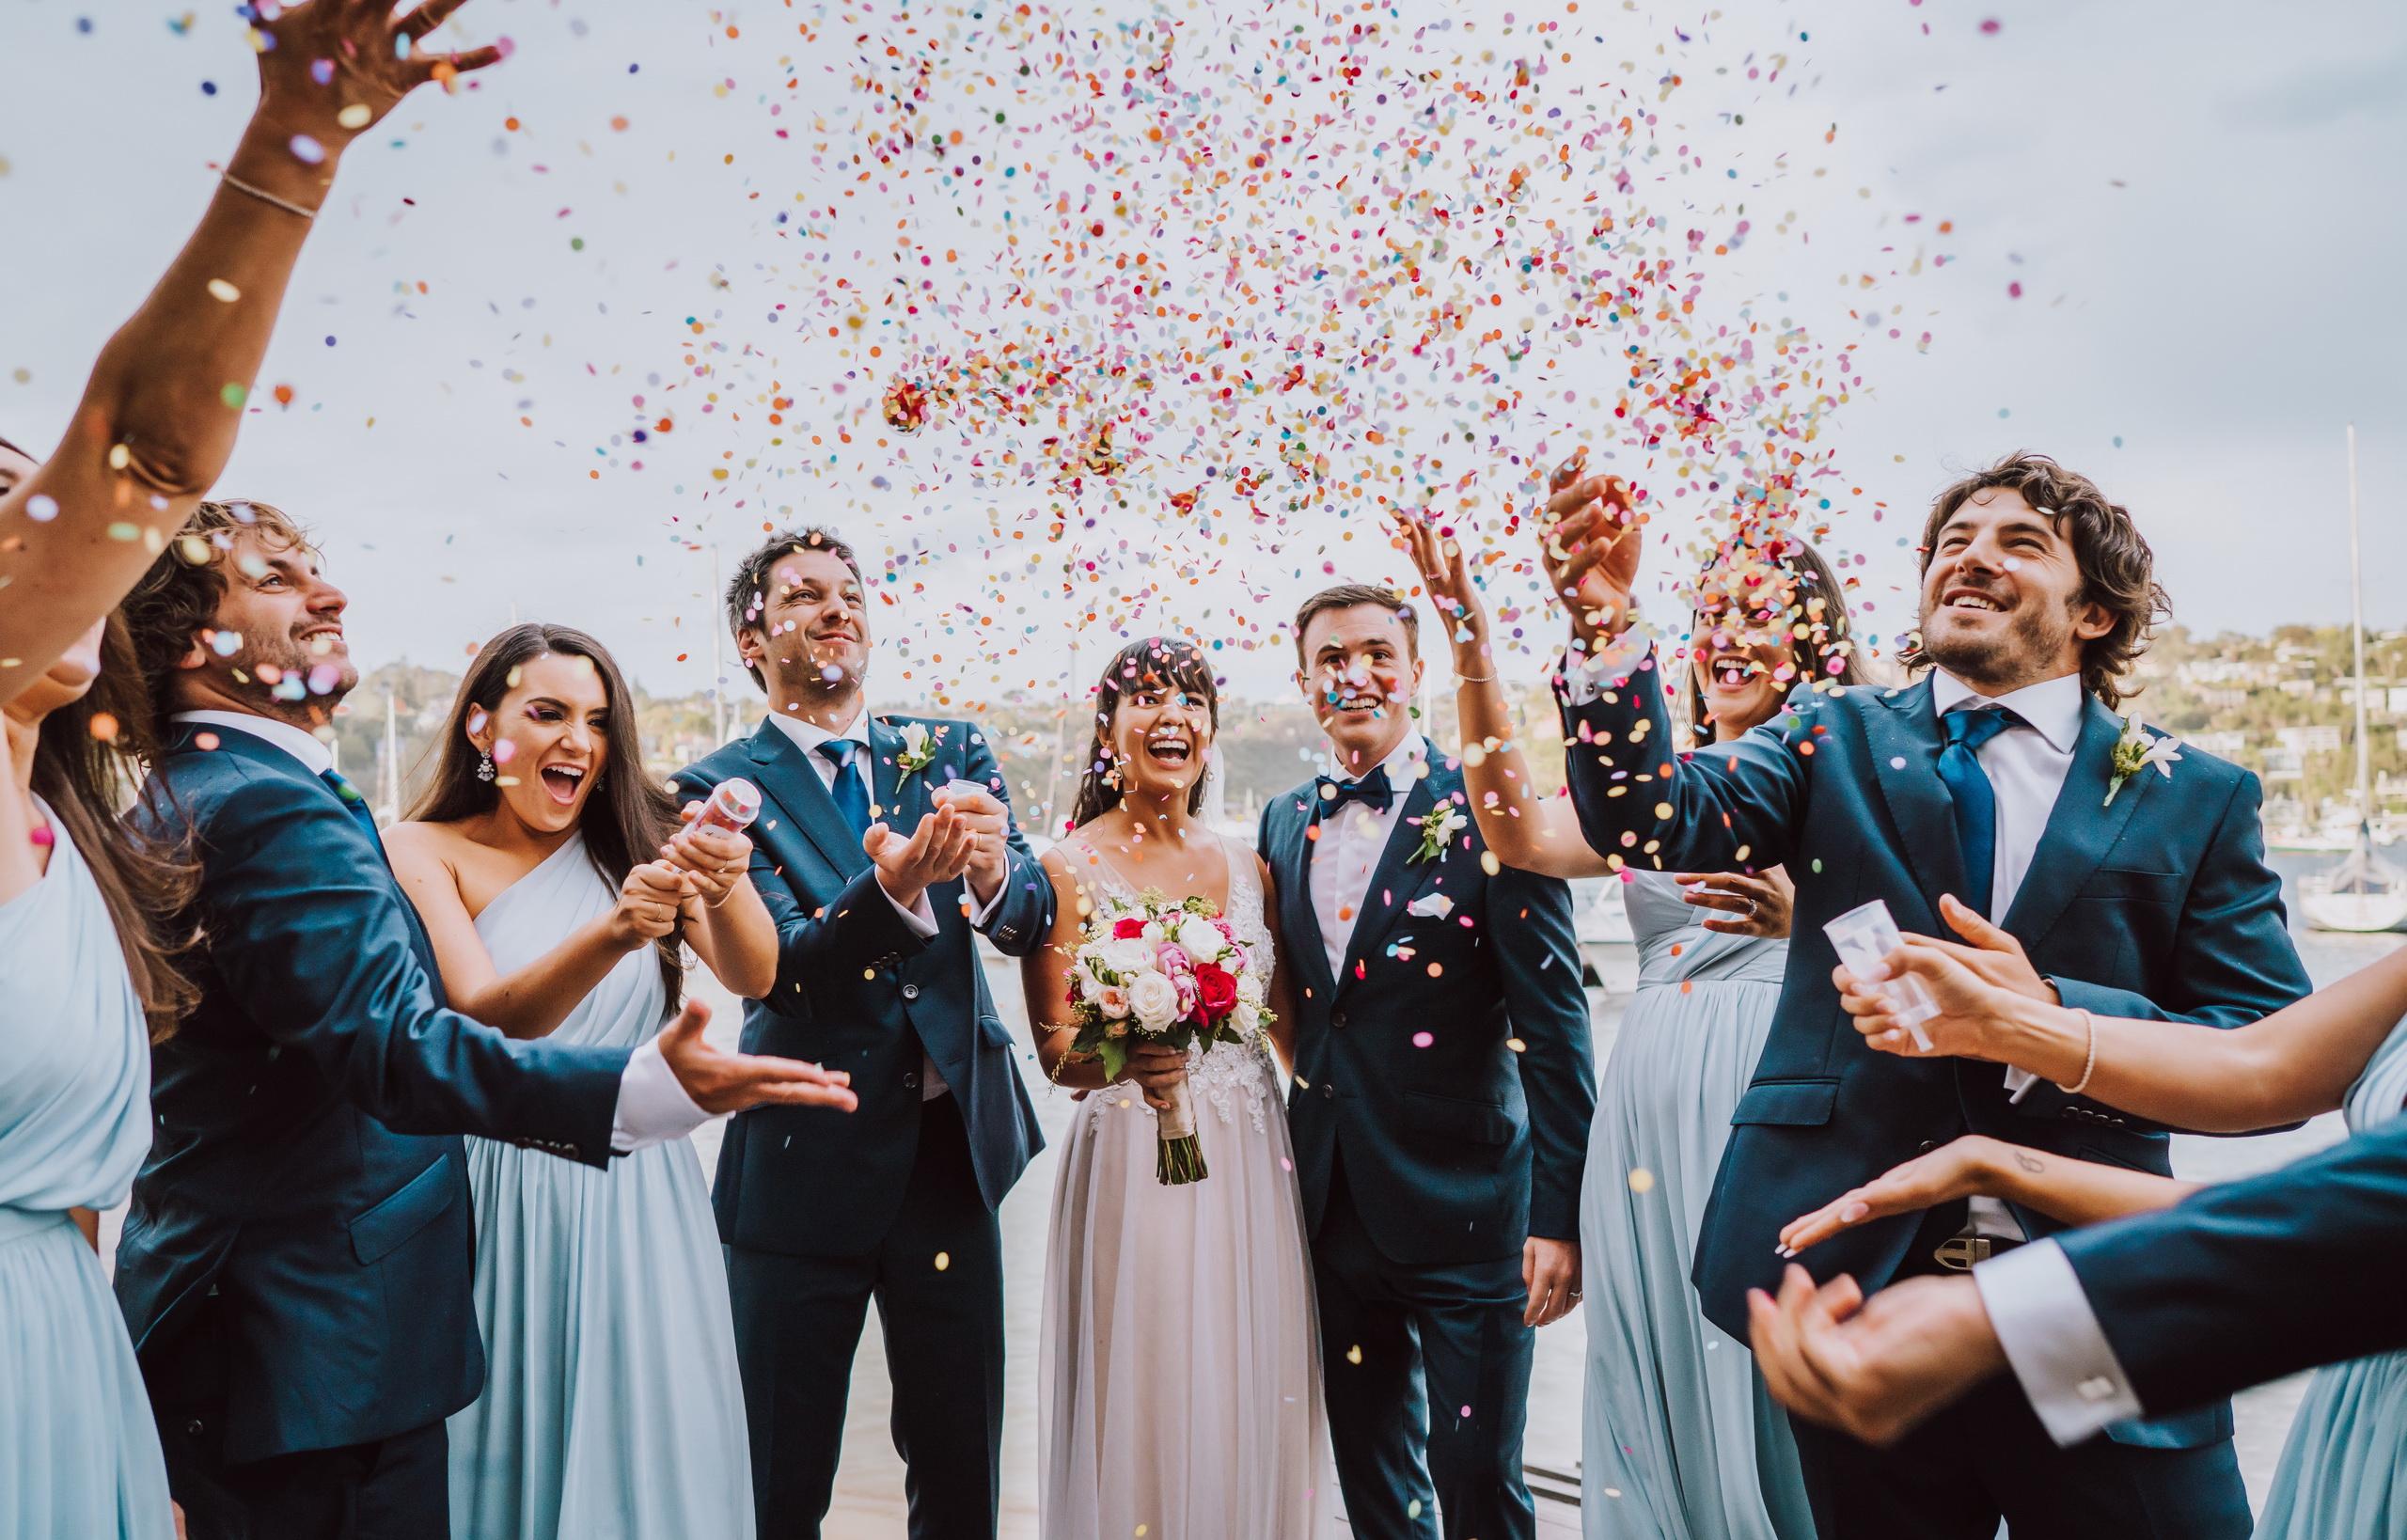 WEDDINGS. PARTIES. CORPORATE. CONFERENCES